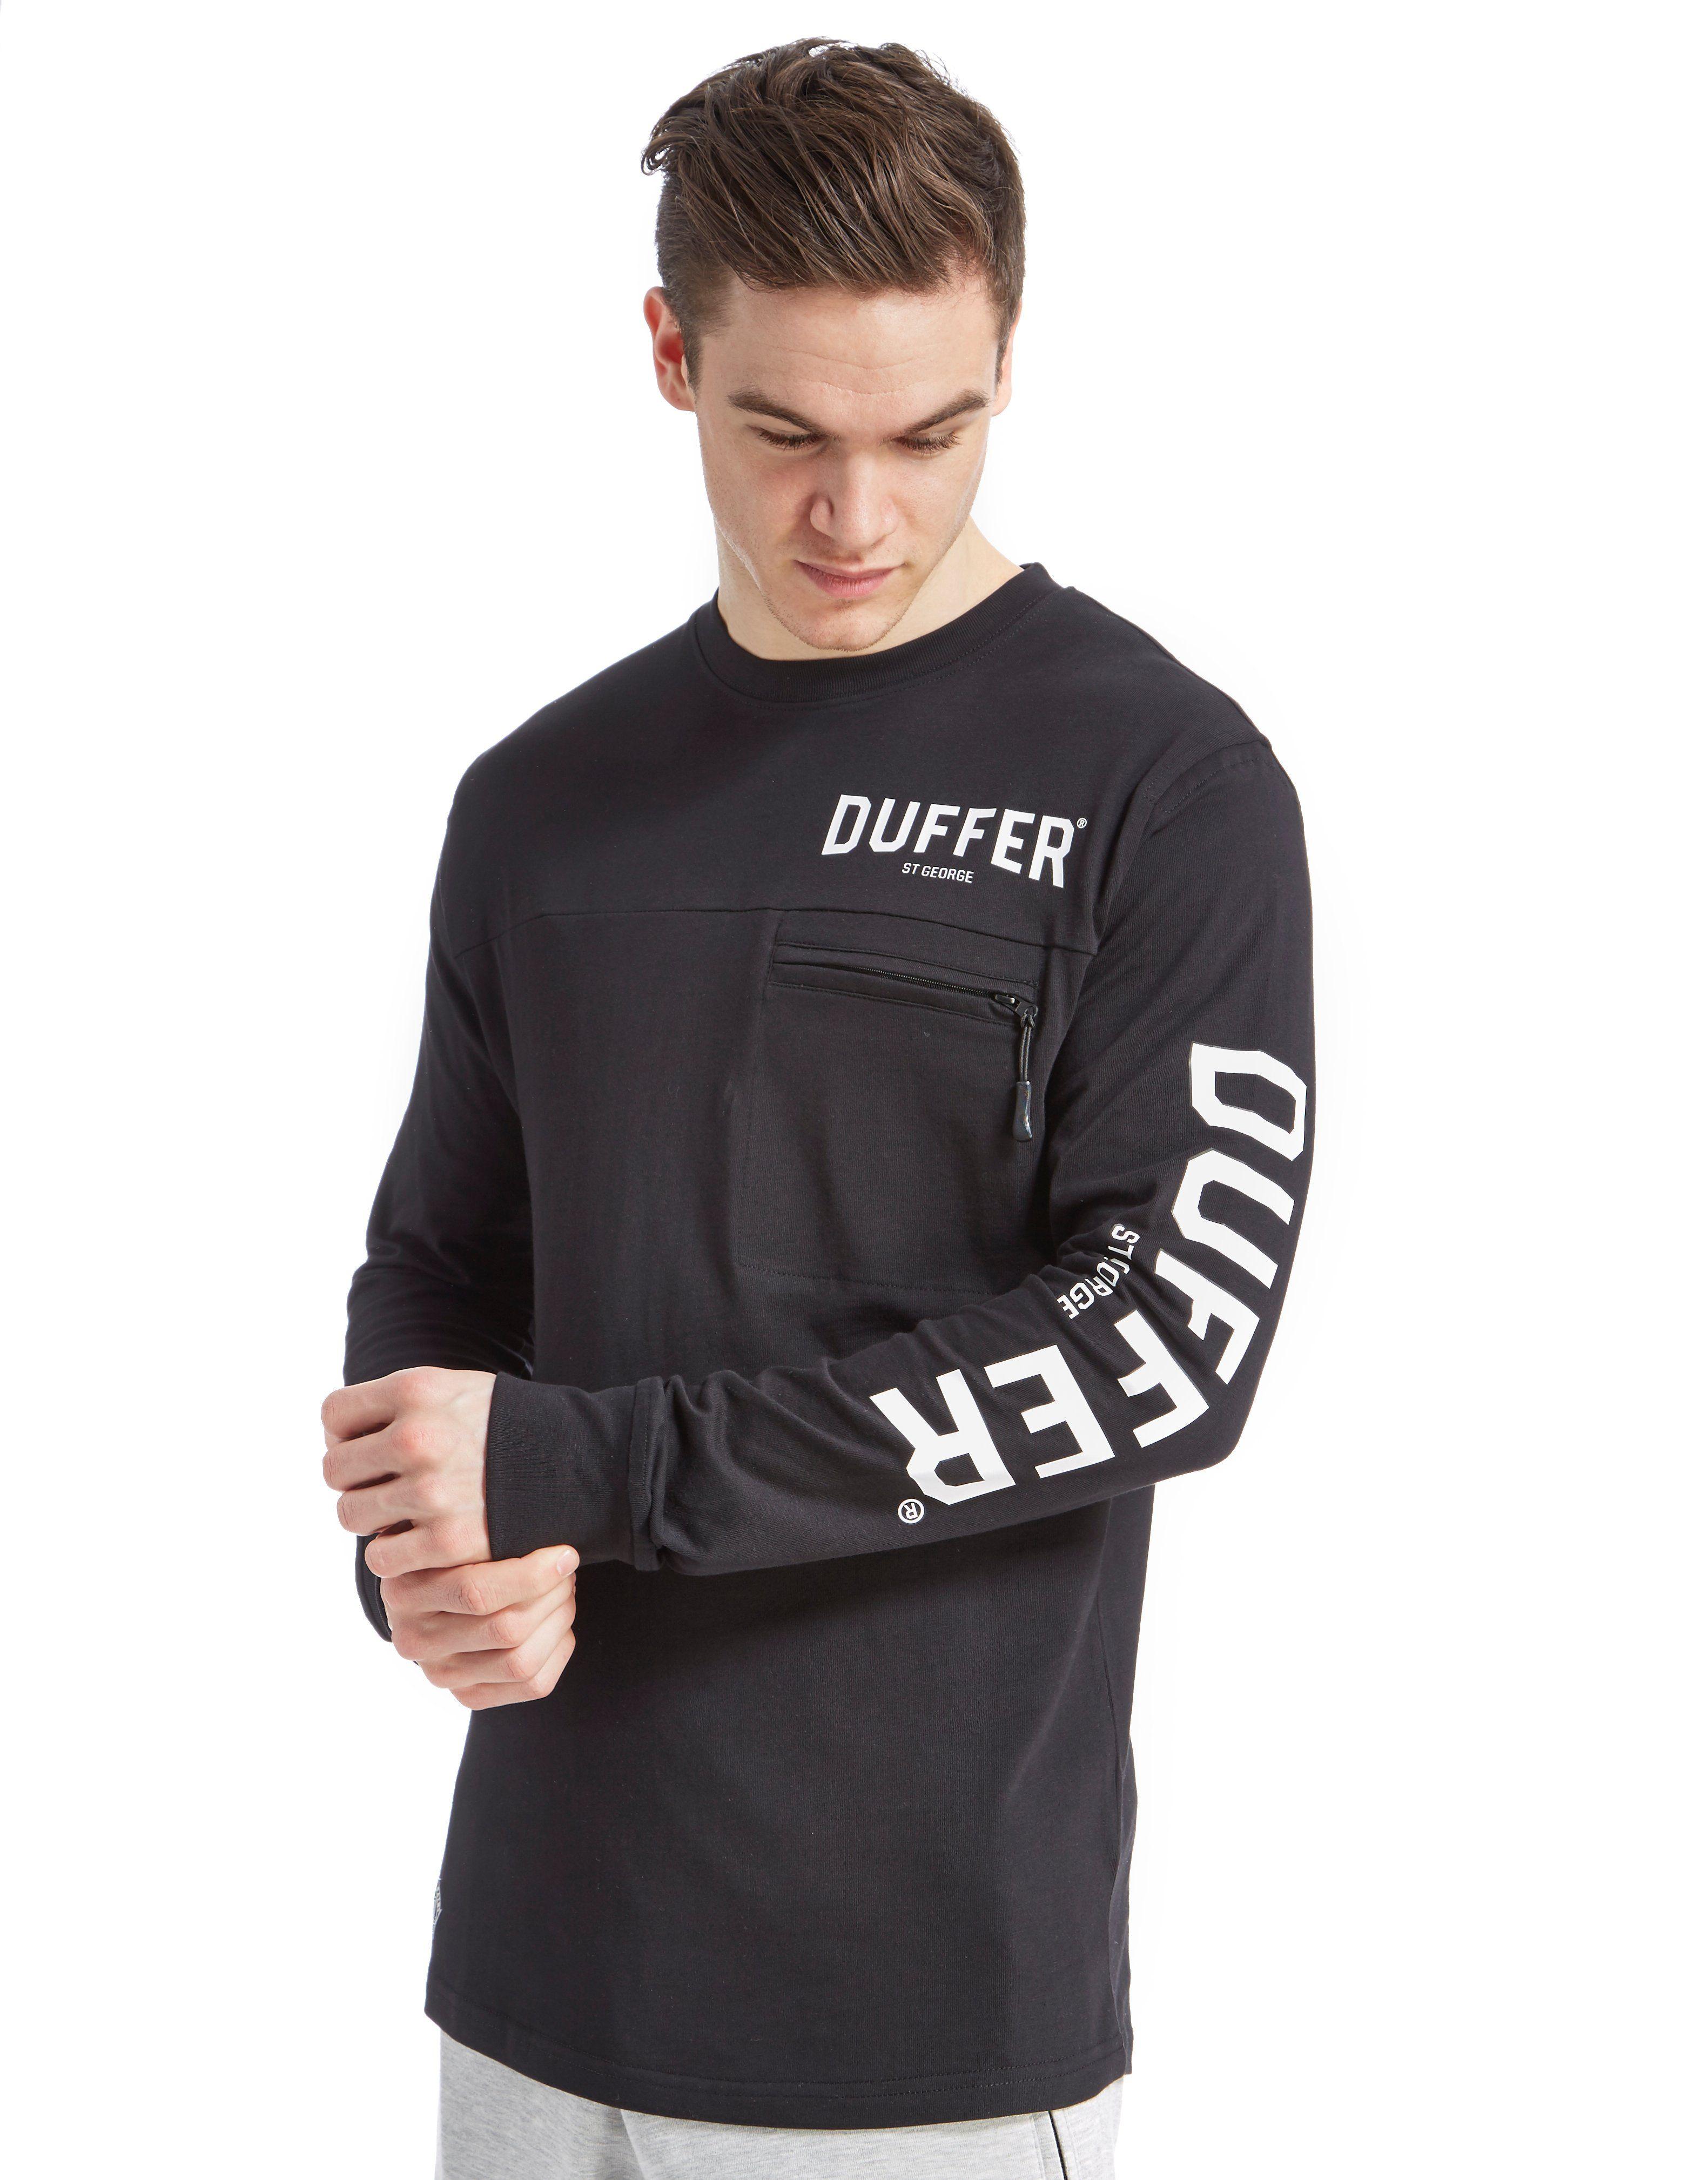 Duffer of St George Black Label Sigma Long Sleeve T-Shirt